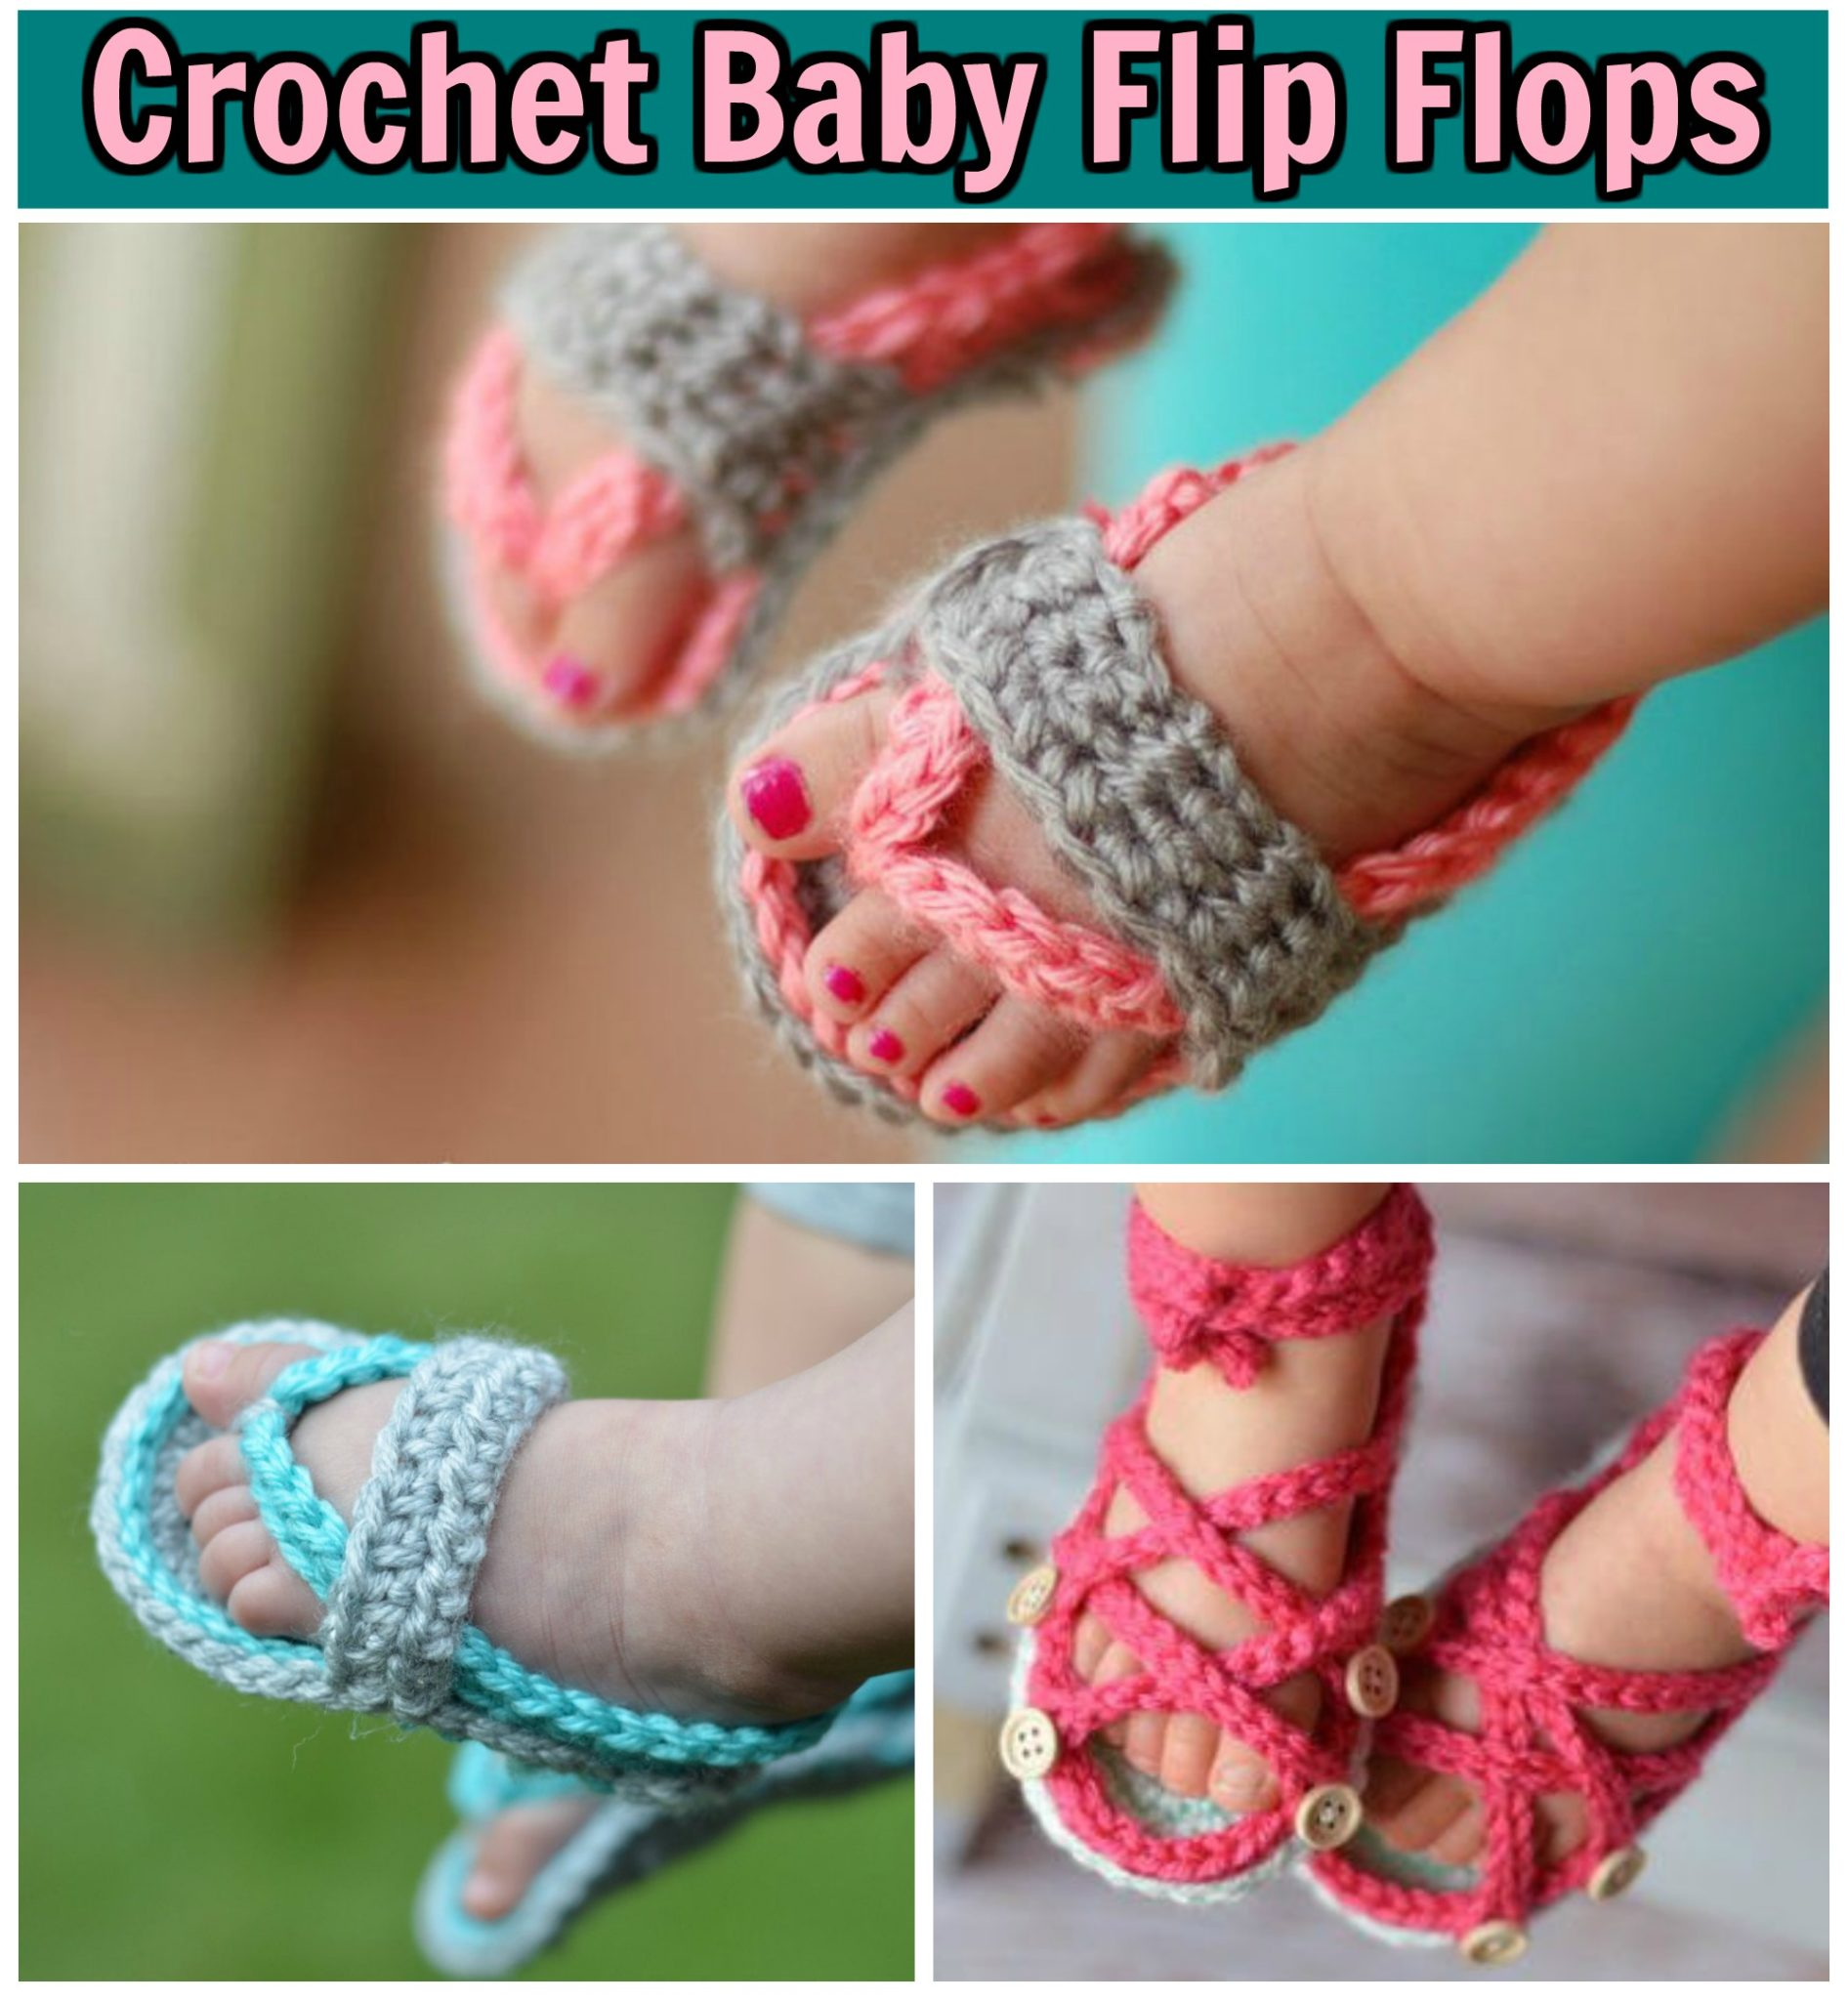 Crochet Baby Flip Flops - Kitchen Fun